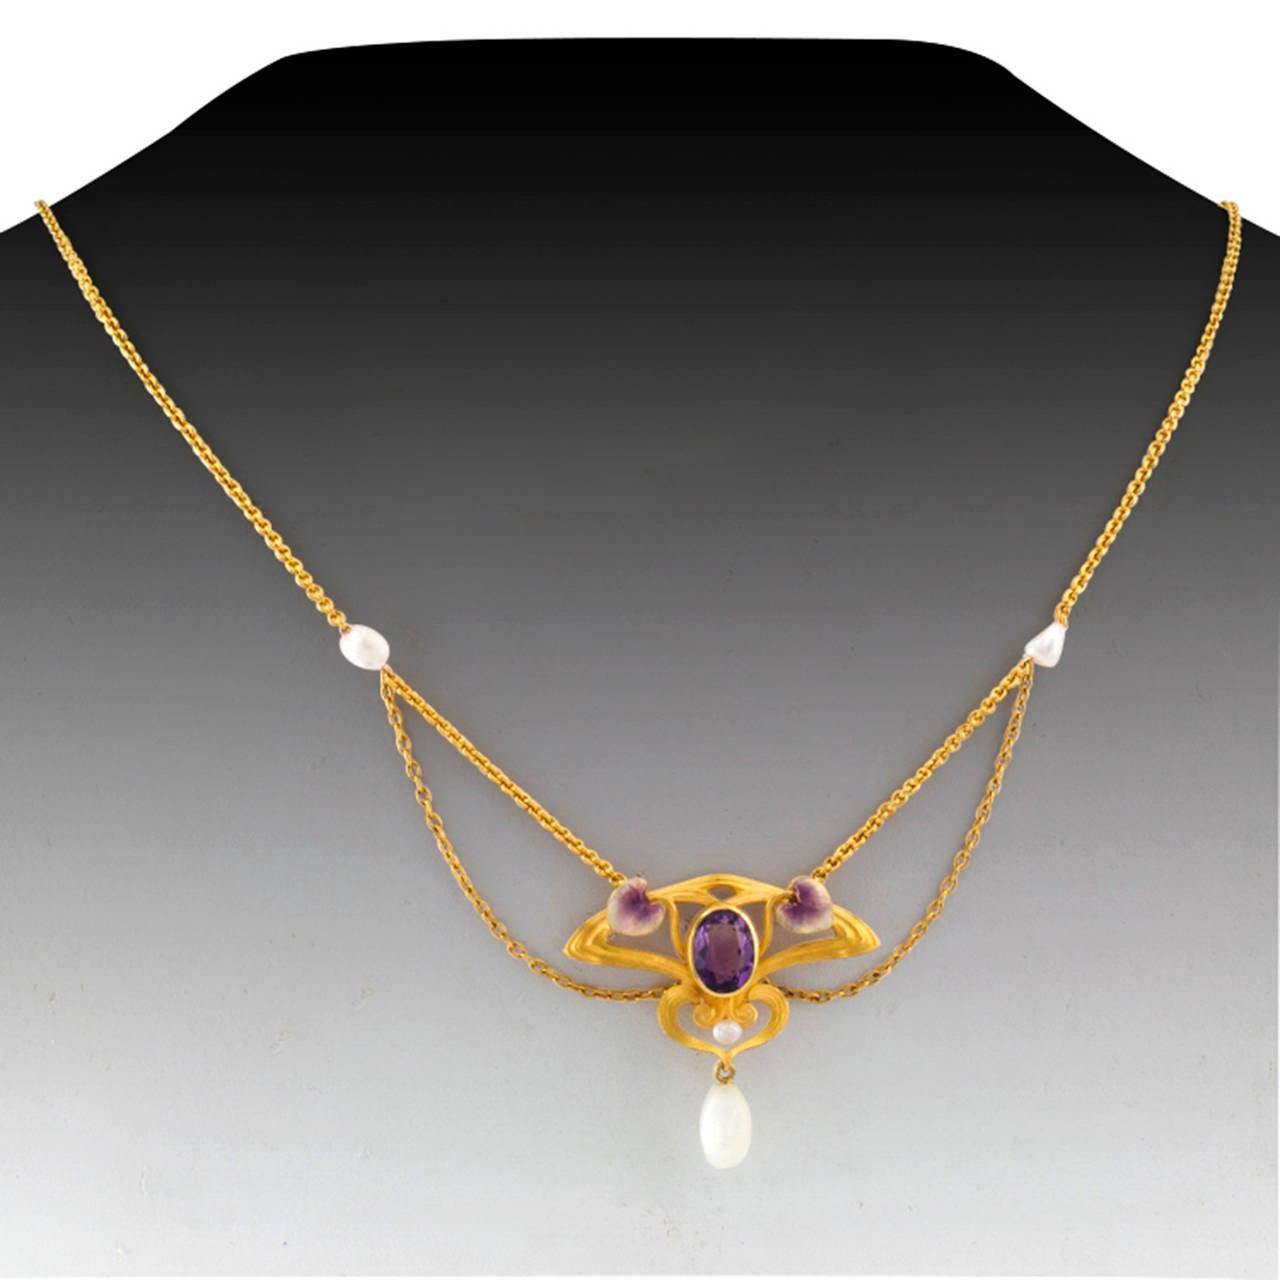 Krementz Art Nouveau Pearl Enamel Amethyst Necklace In Excellent Condition For Sale In Los Angeles, CA